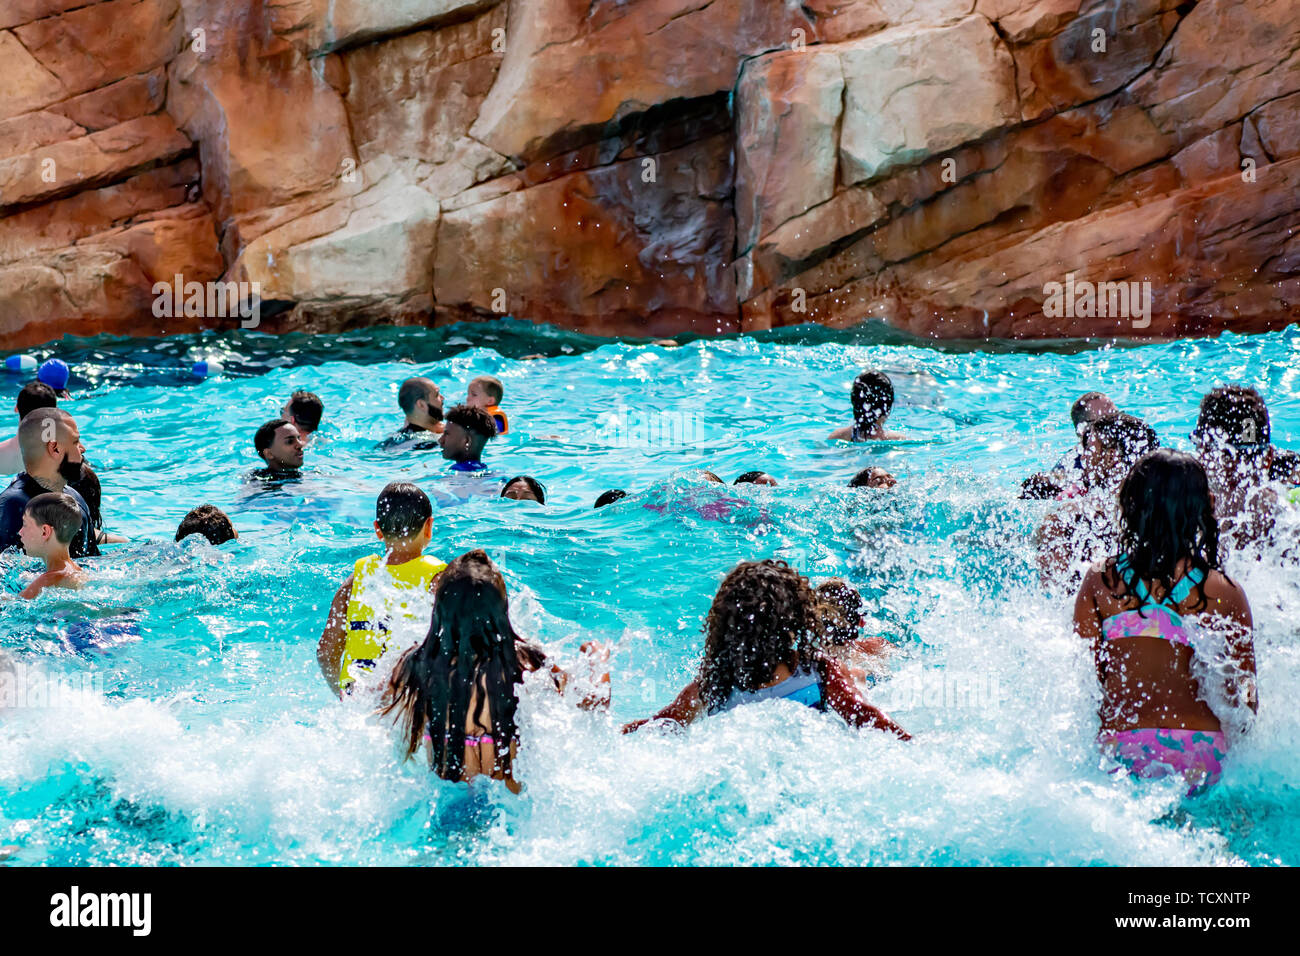 Orlando, Florida. April 07, 2019. Parents and kids having fun pool on bluelight water at Aquatica (5) Stock Photo